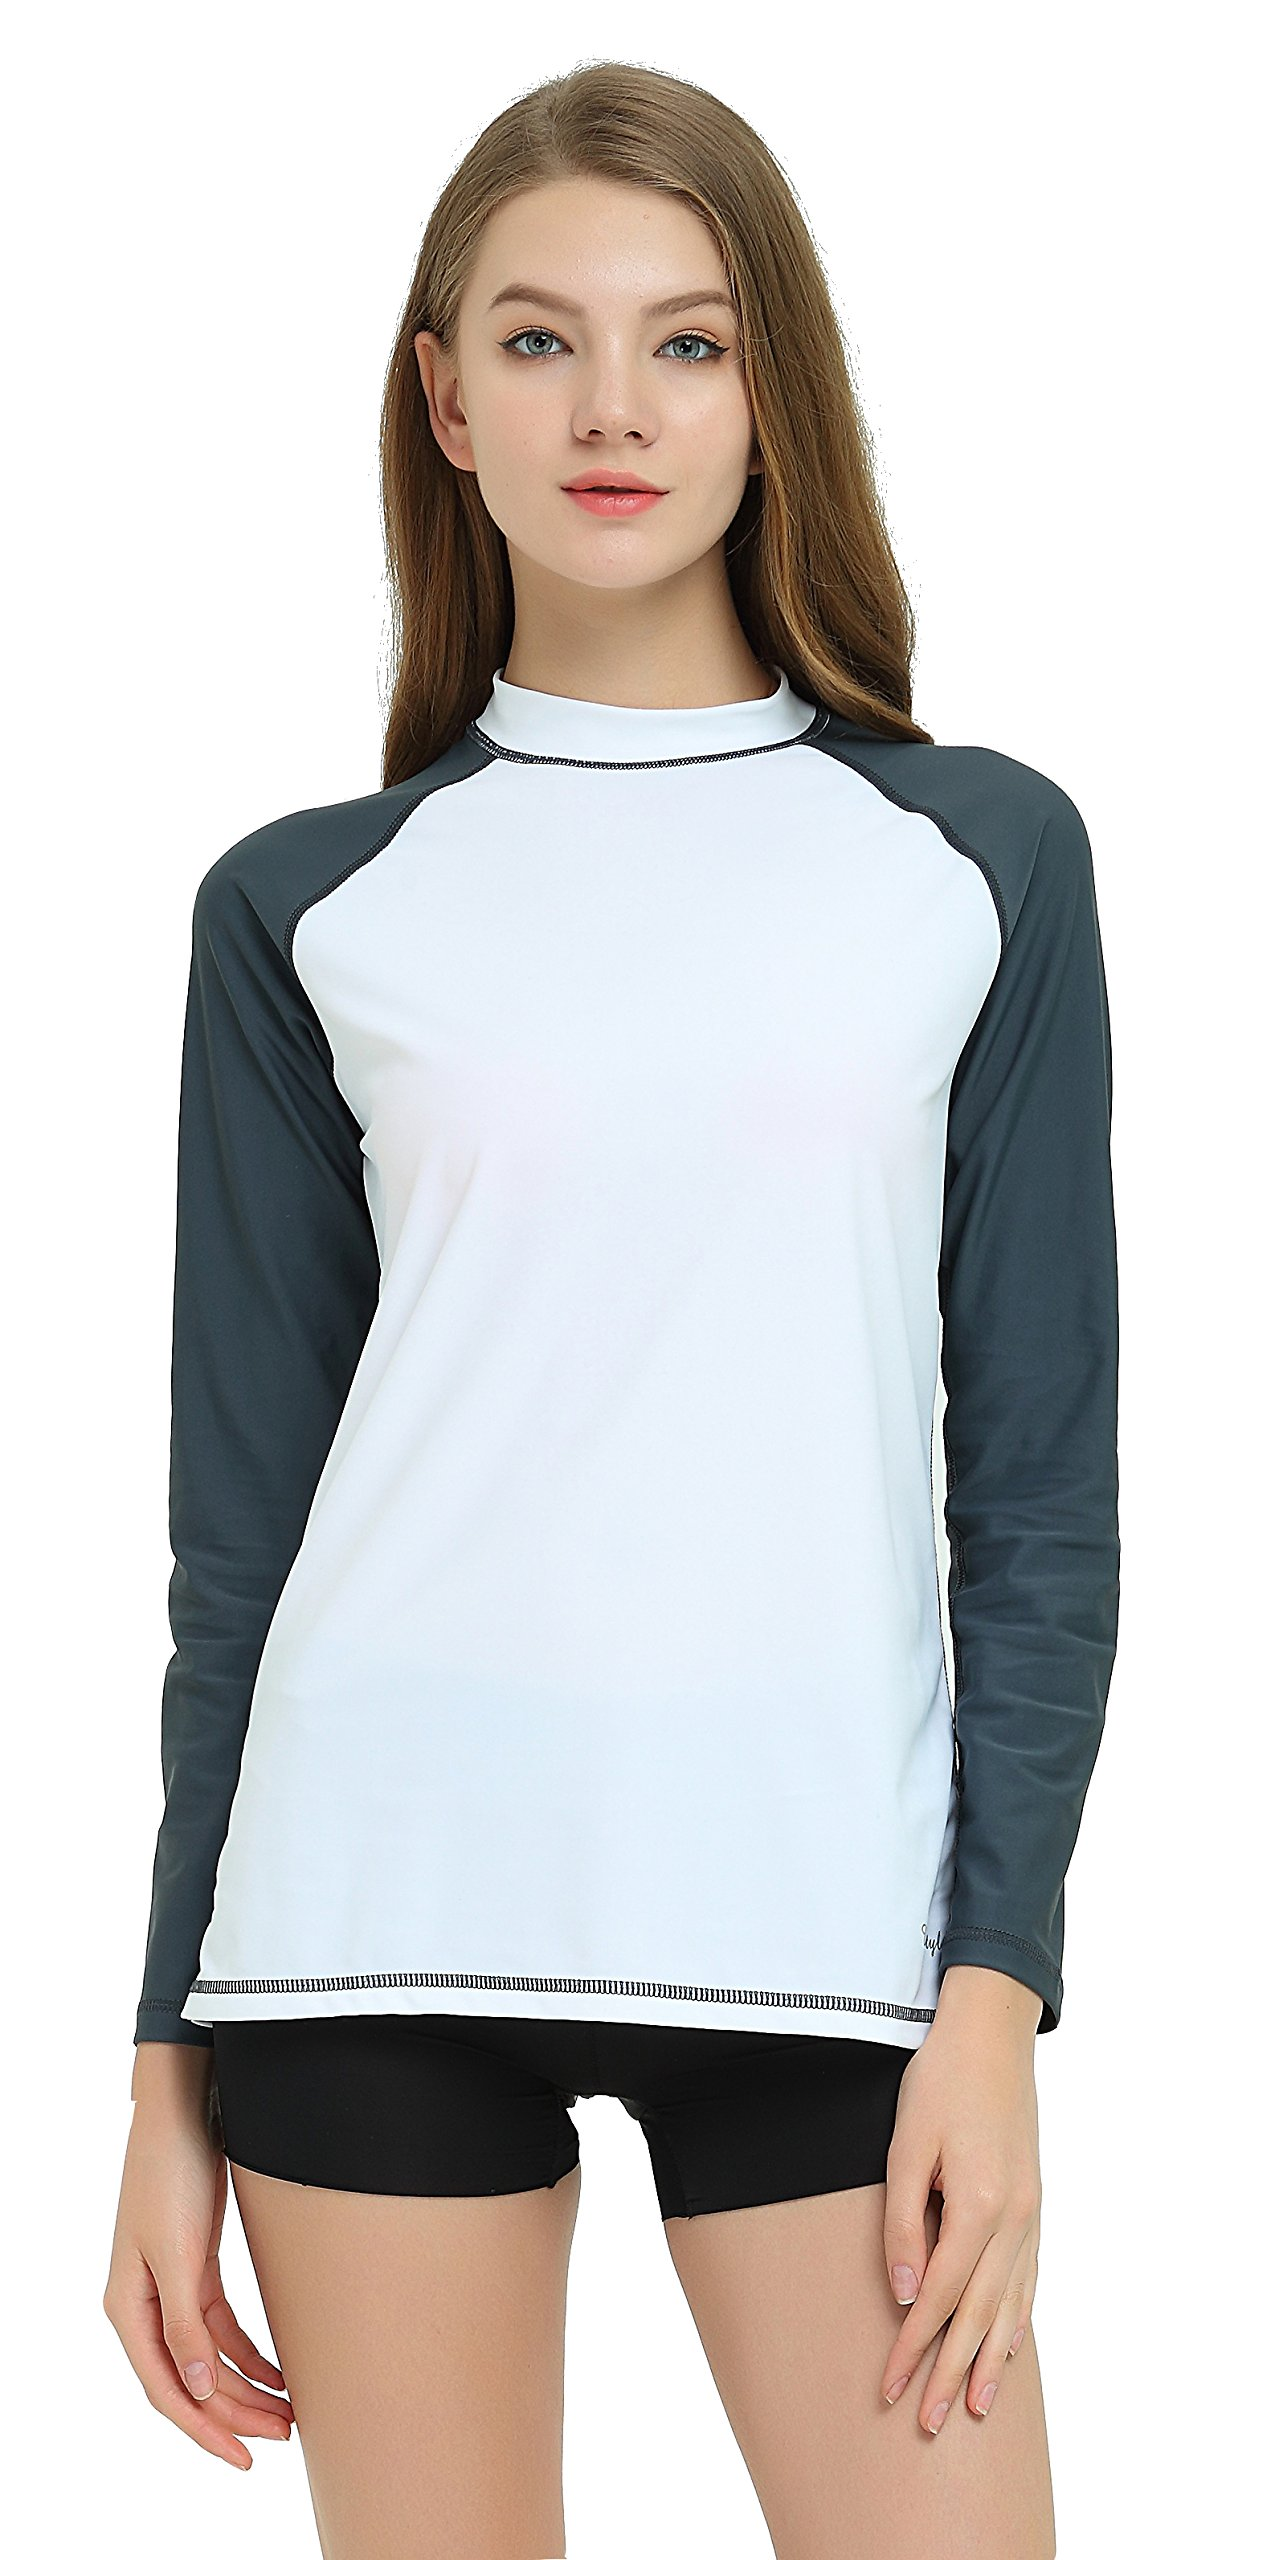 Ubestyle Women's UPF 50+ Long Sleeve Rashguard Swimwear Rash Guard Athletic Tops (White-Gray, L)